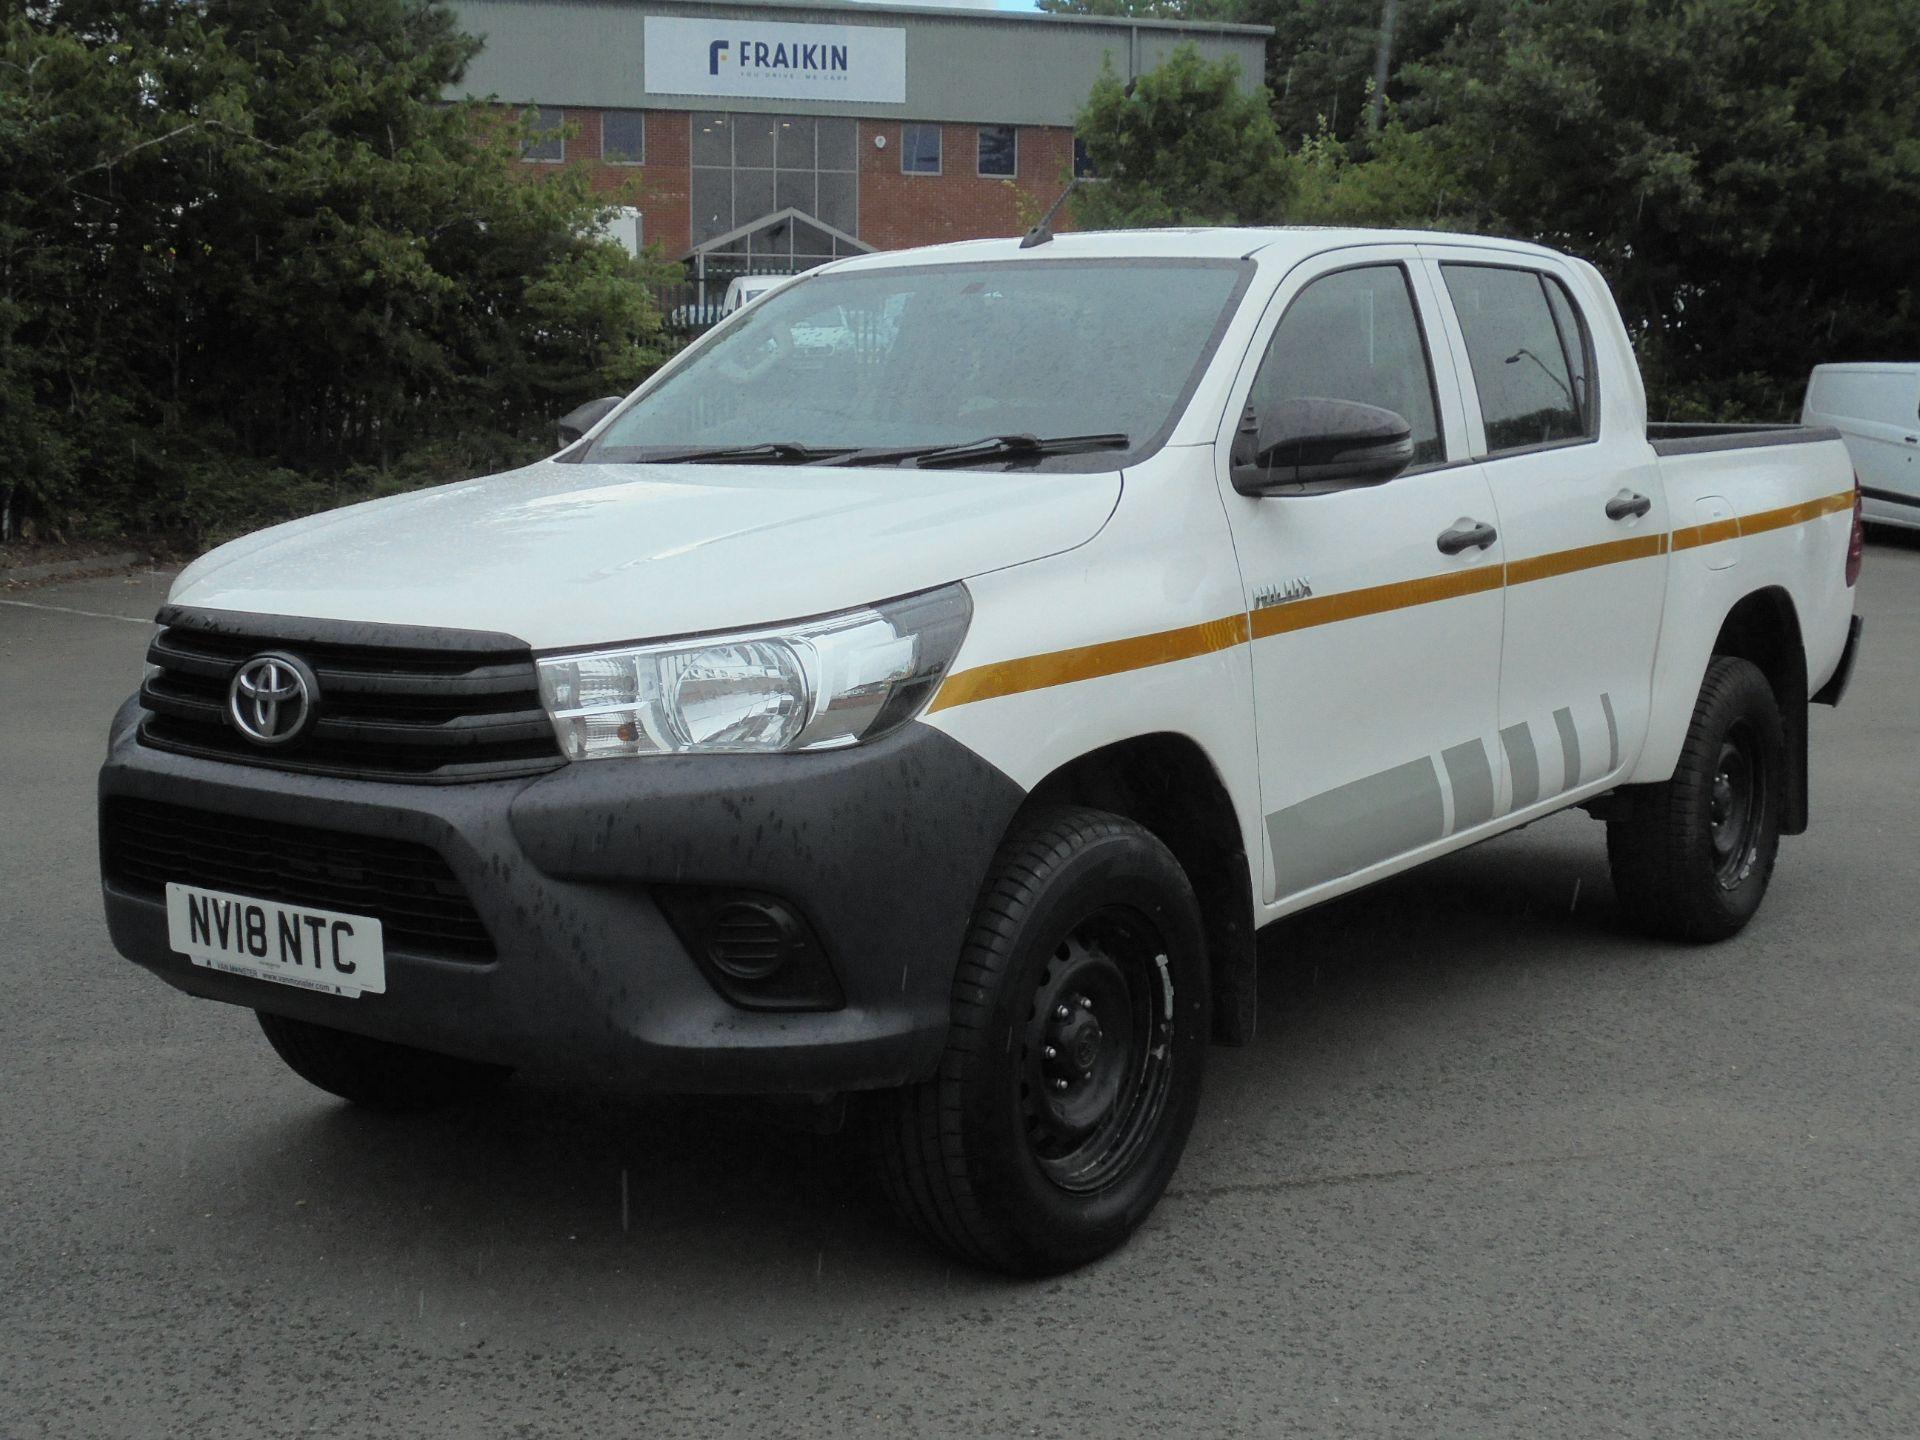 2018 Toyota Hilux Active D/Cab Pick Up 2.5 D-4D 4Wd 144 (NV18NTC) Image 3